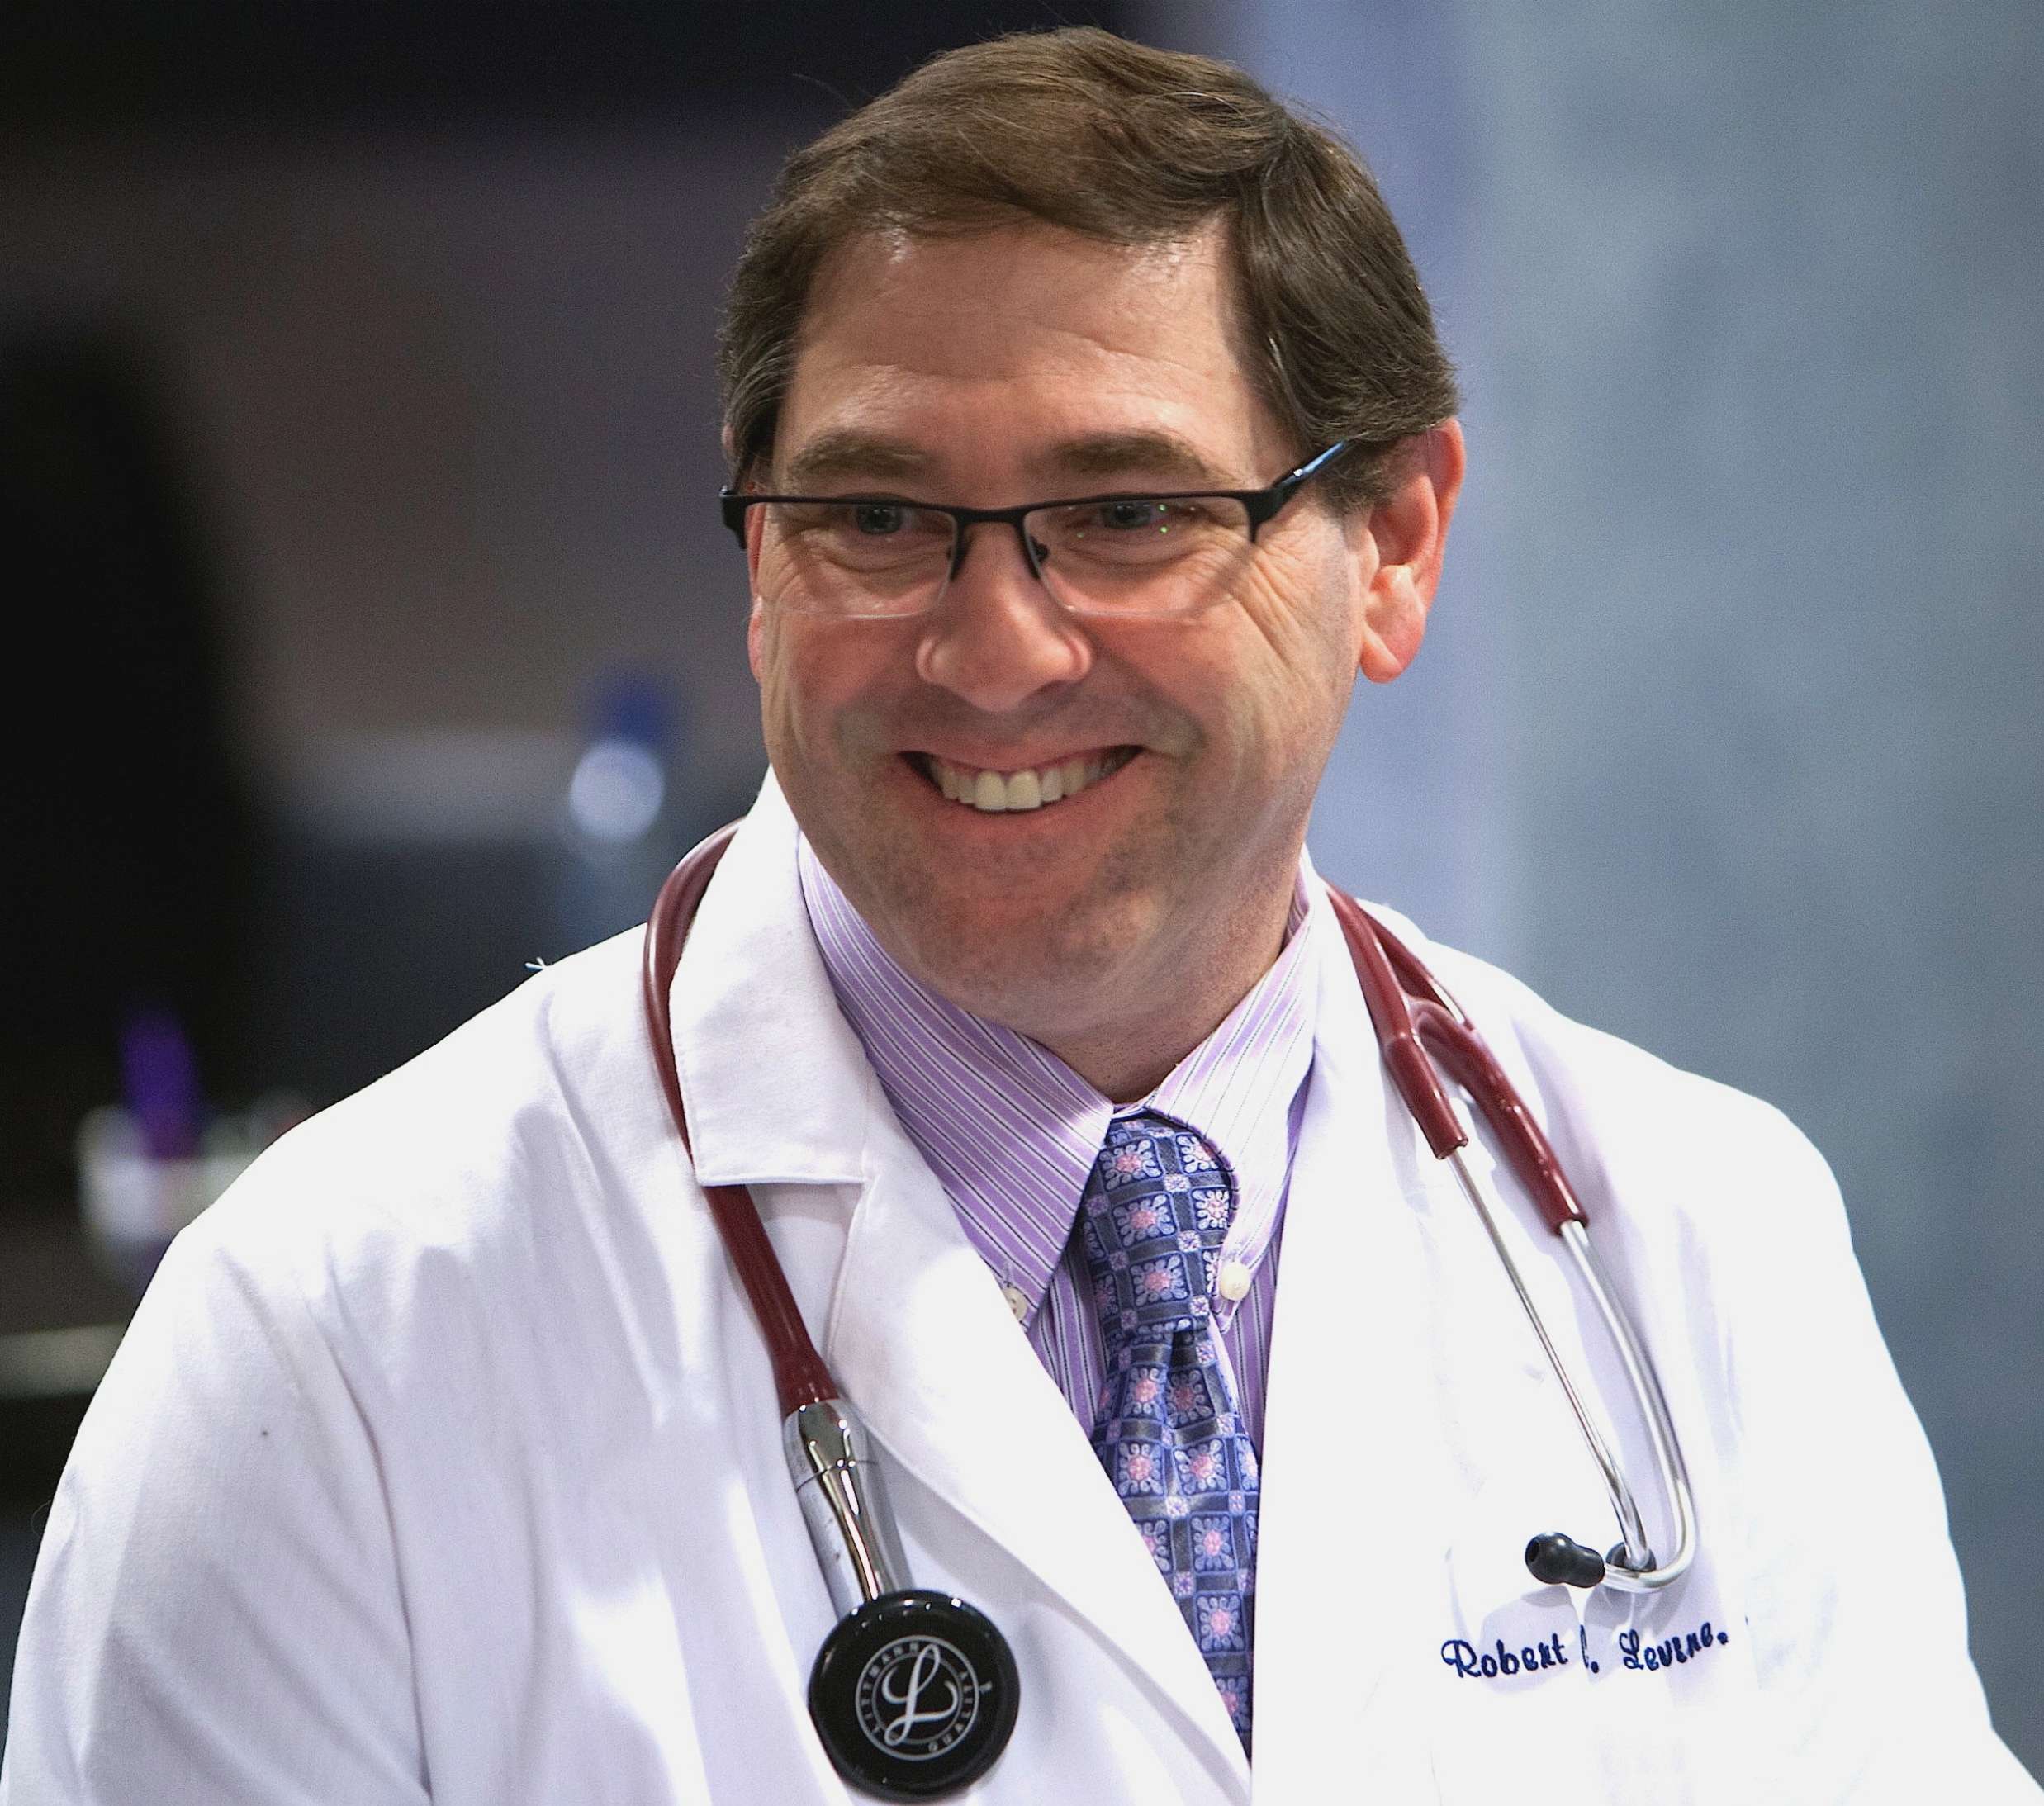 Robert Levine, MD